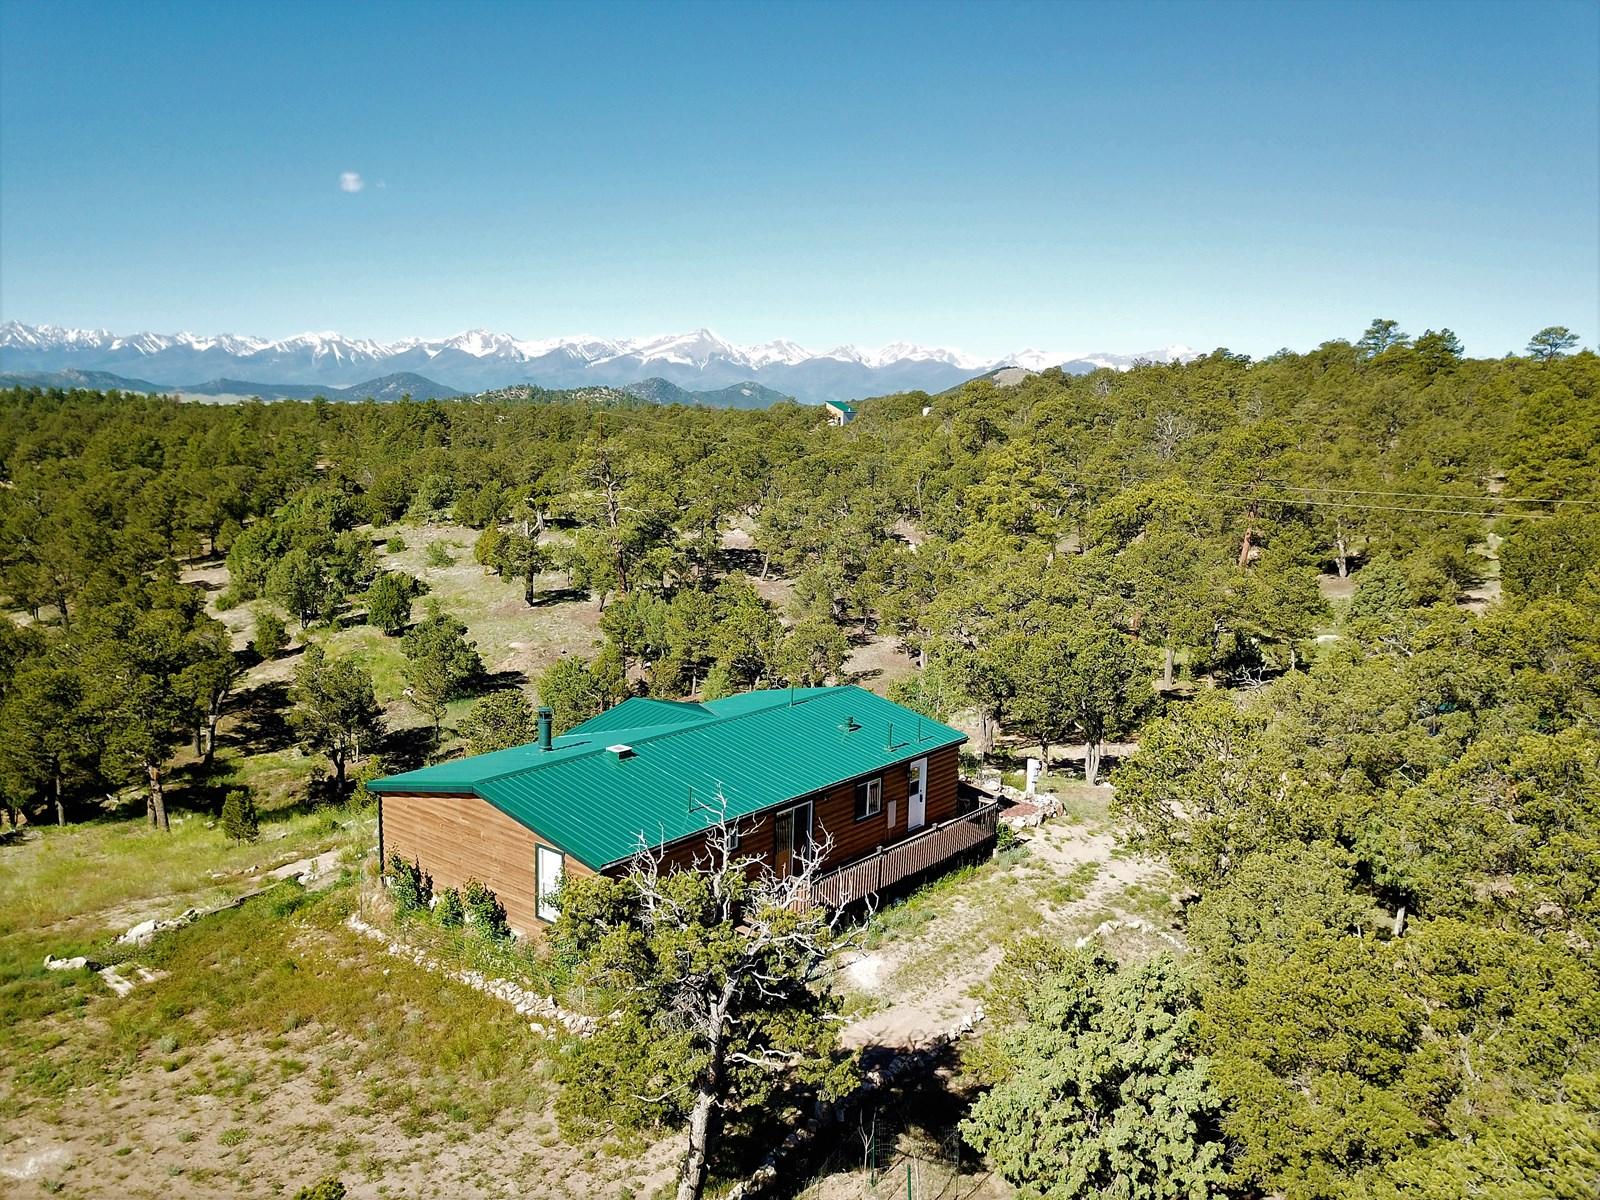 Log-Sided Colorado Mountain Cabin/Home